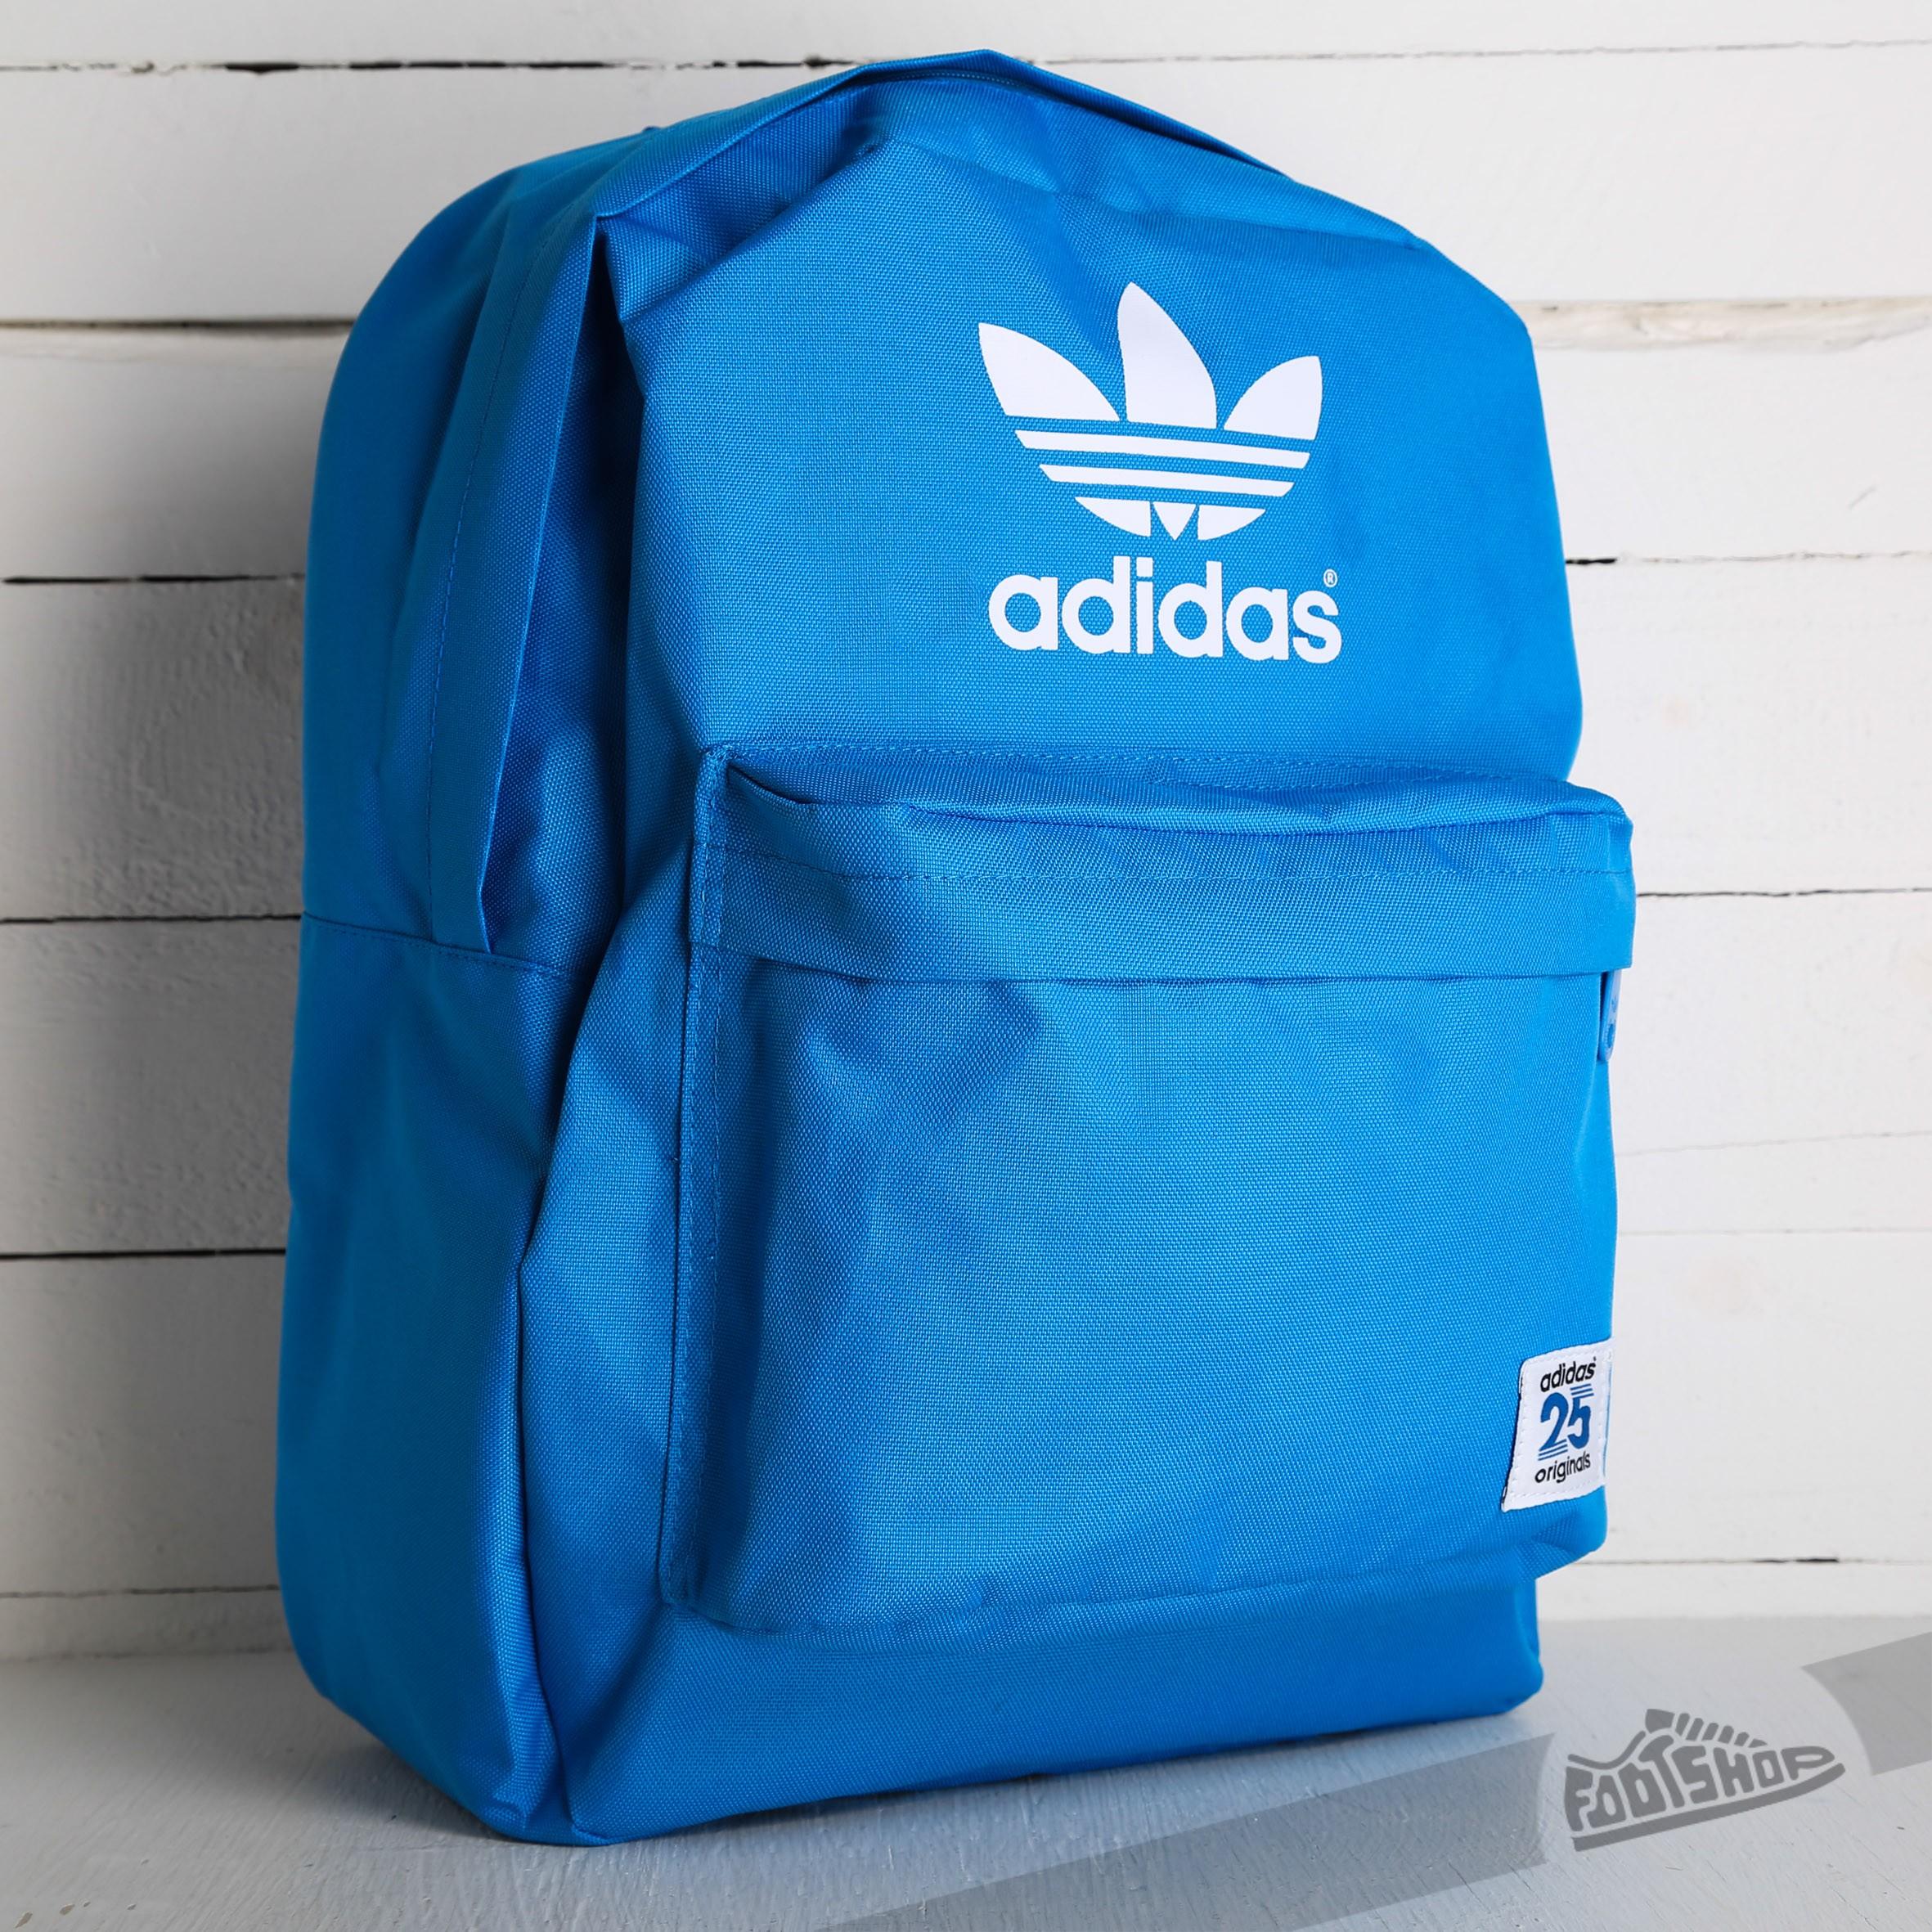 6055b95bc9 adidas Nigo Backpack Bright Blue